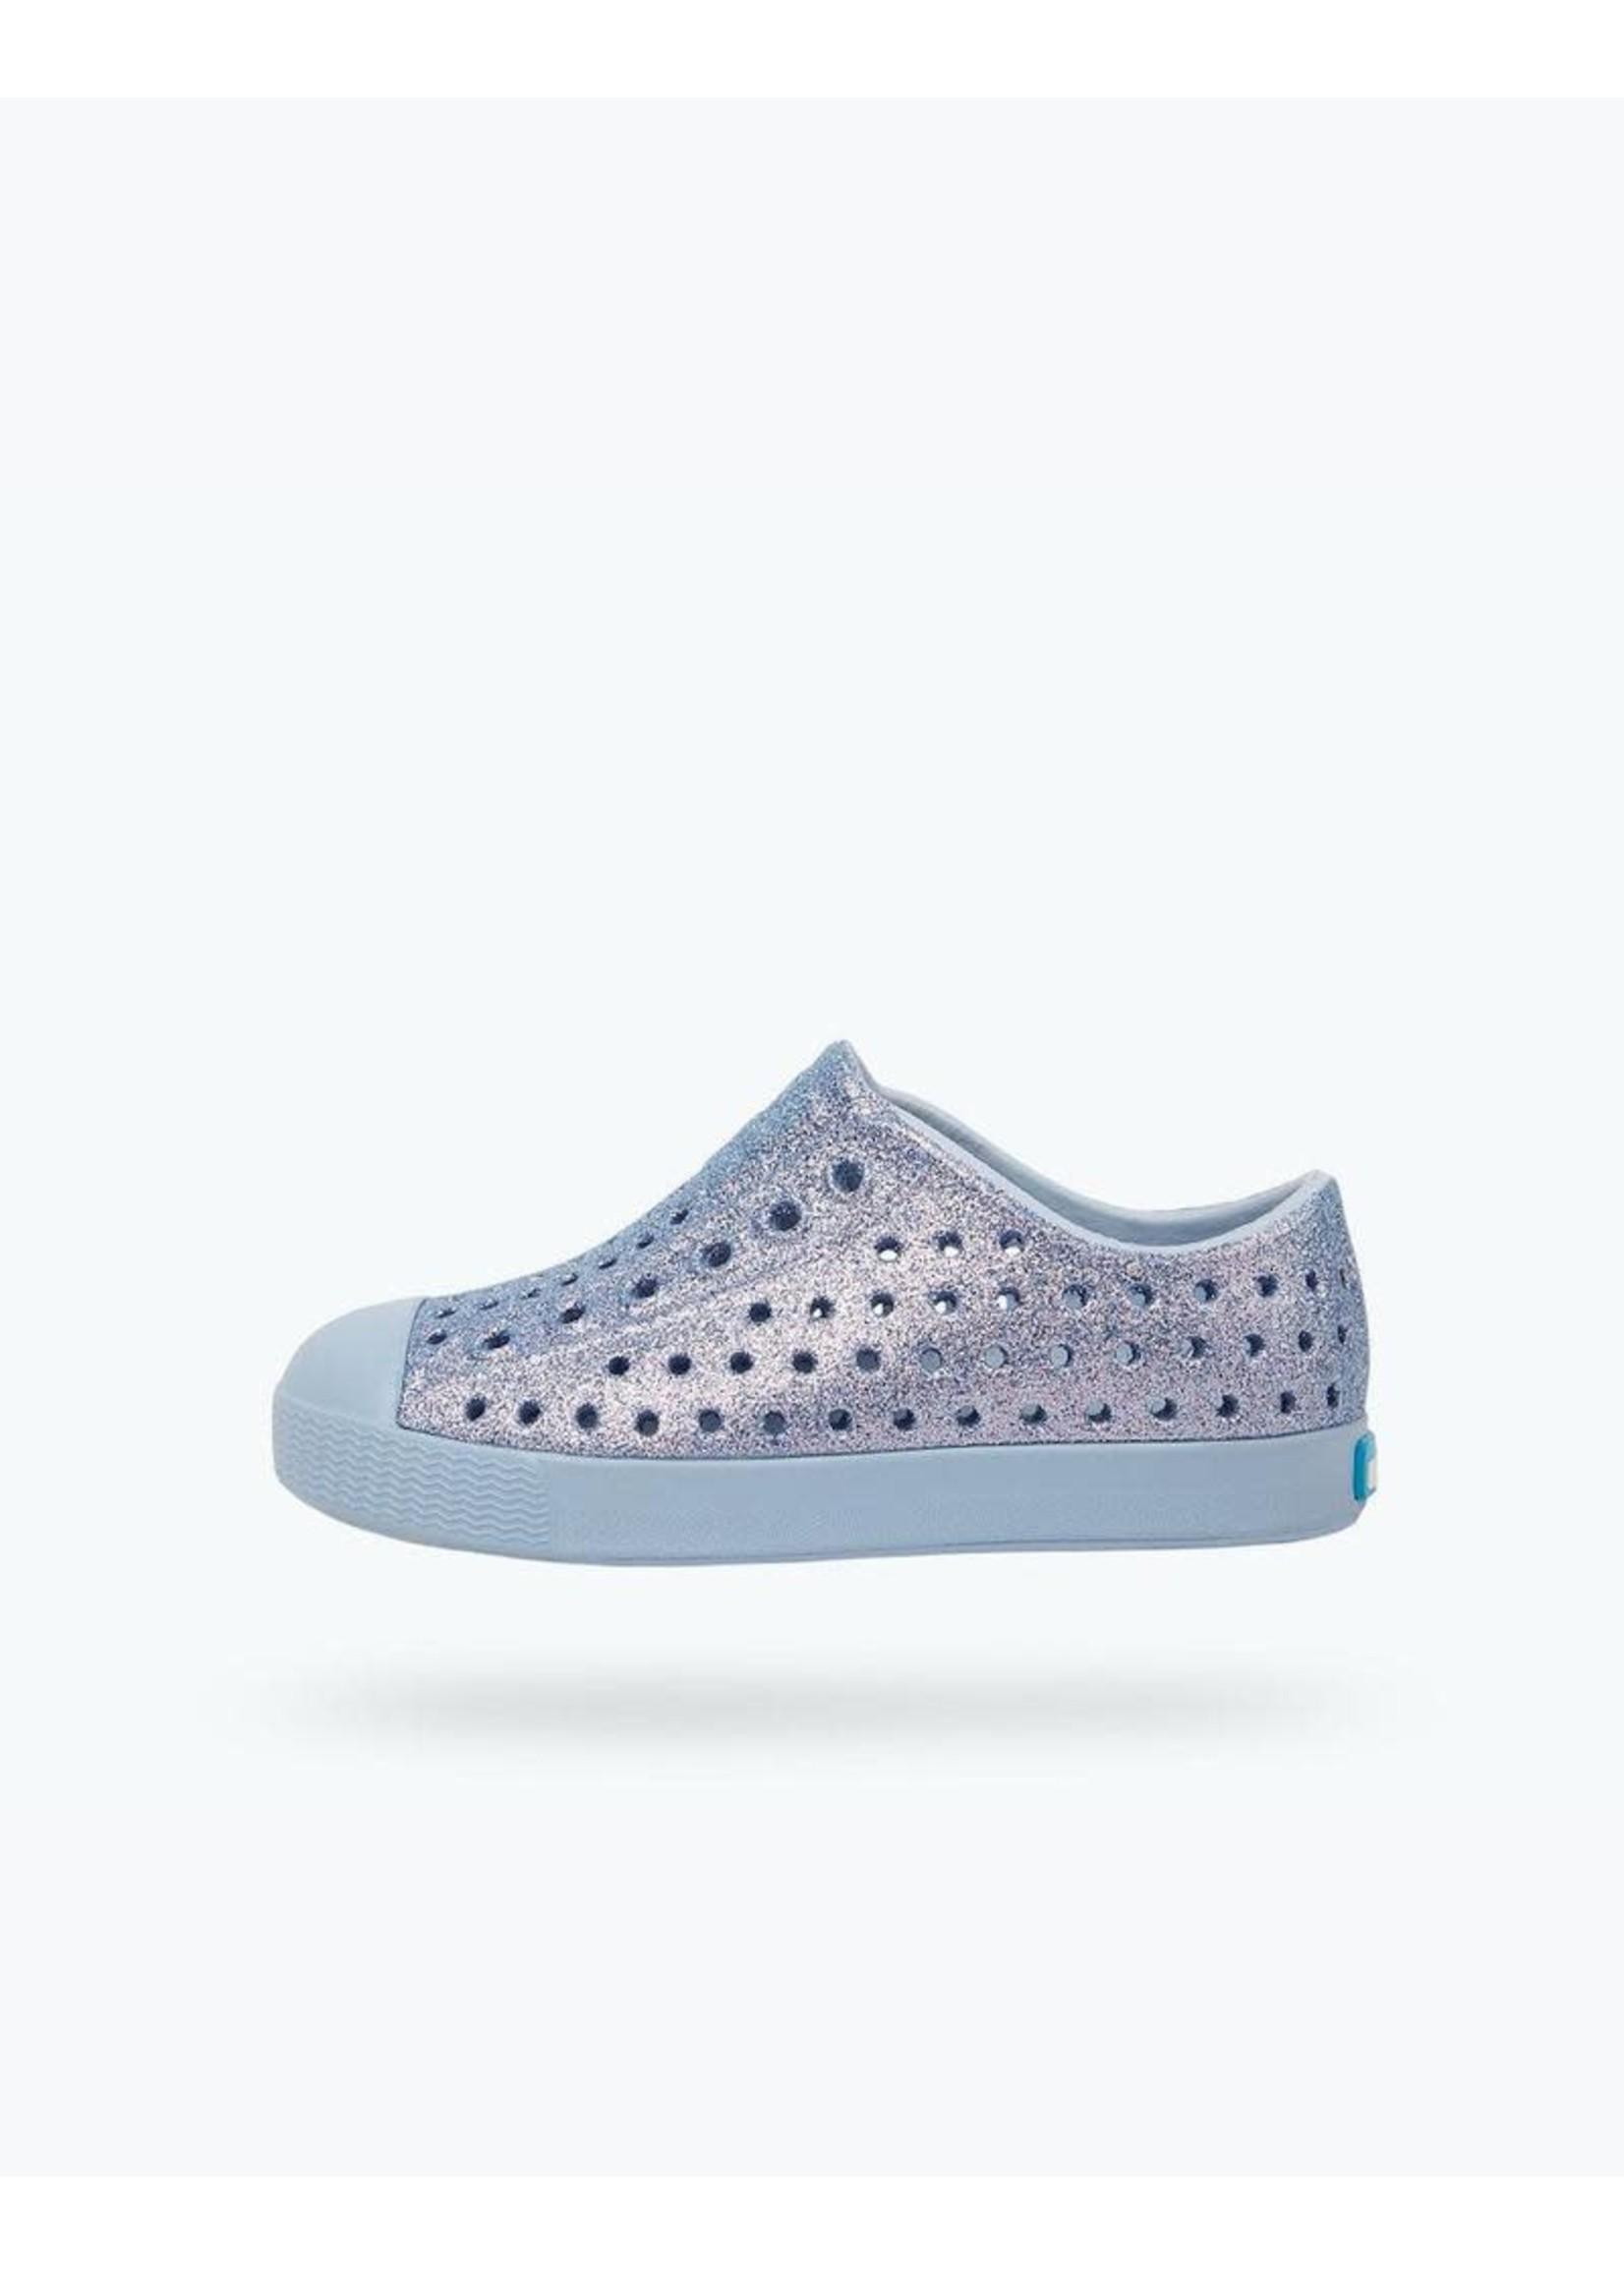 Native Shoes Native Shoes, Jefferson Bling Child in Alaska Bling/ Alaska Blue